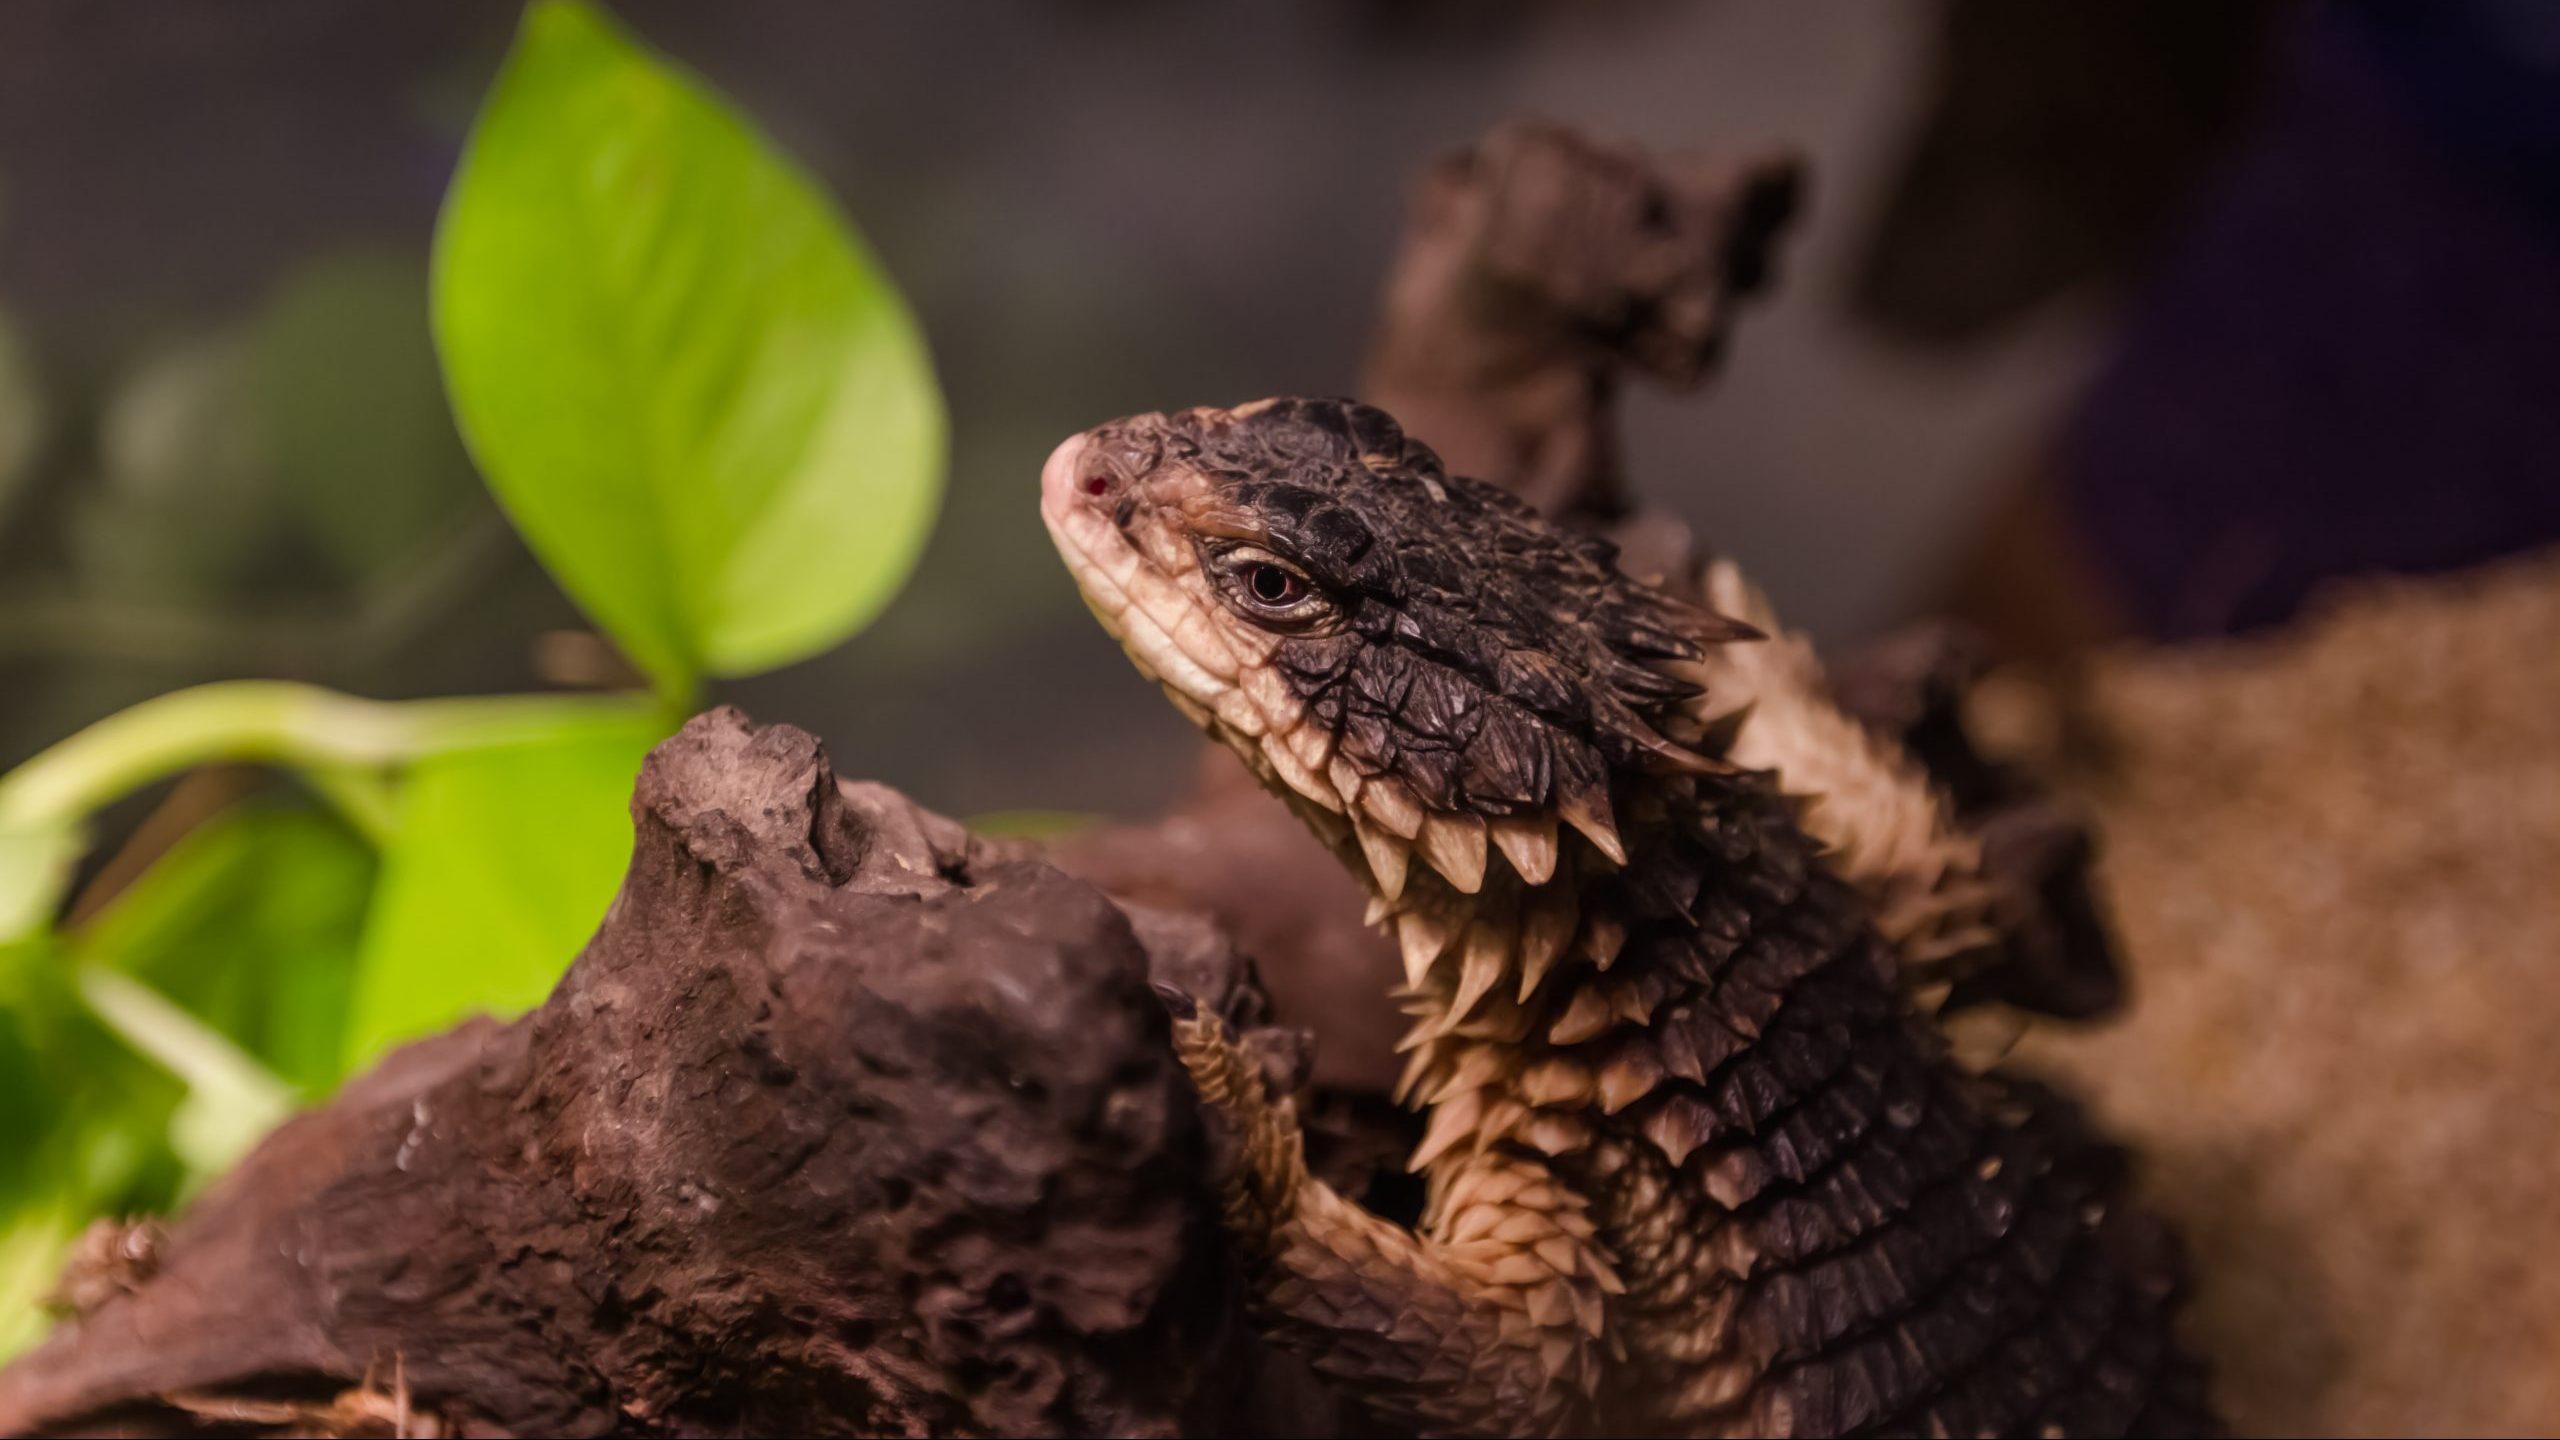 Jones Armadillo Lizard Care Alsip Home Nursery